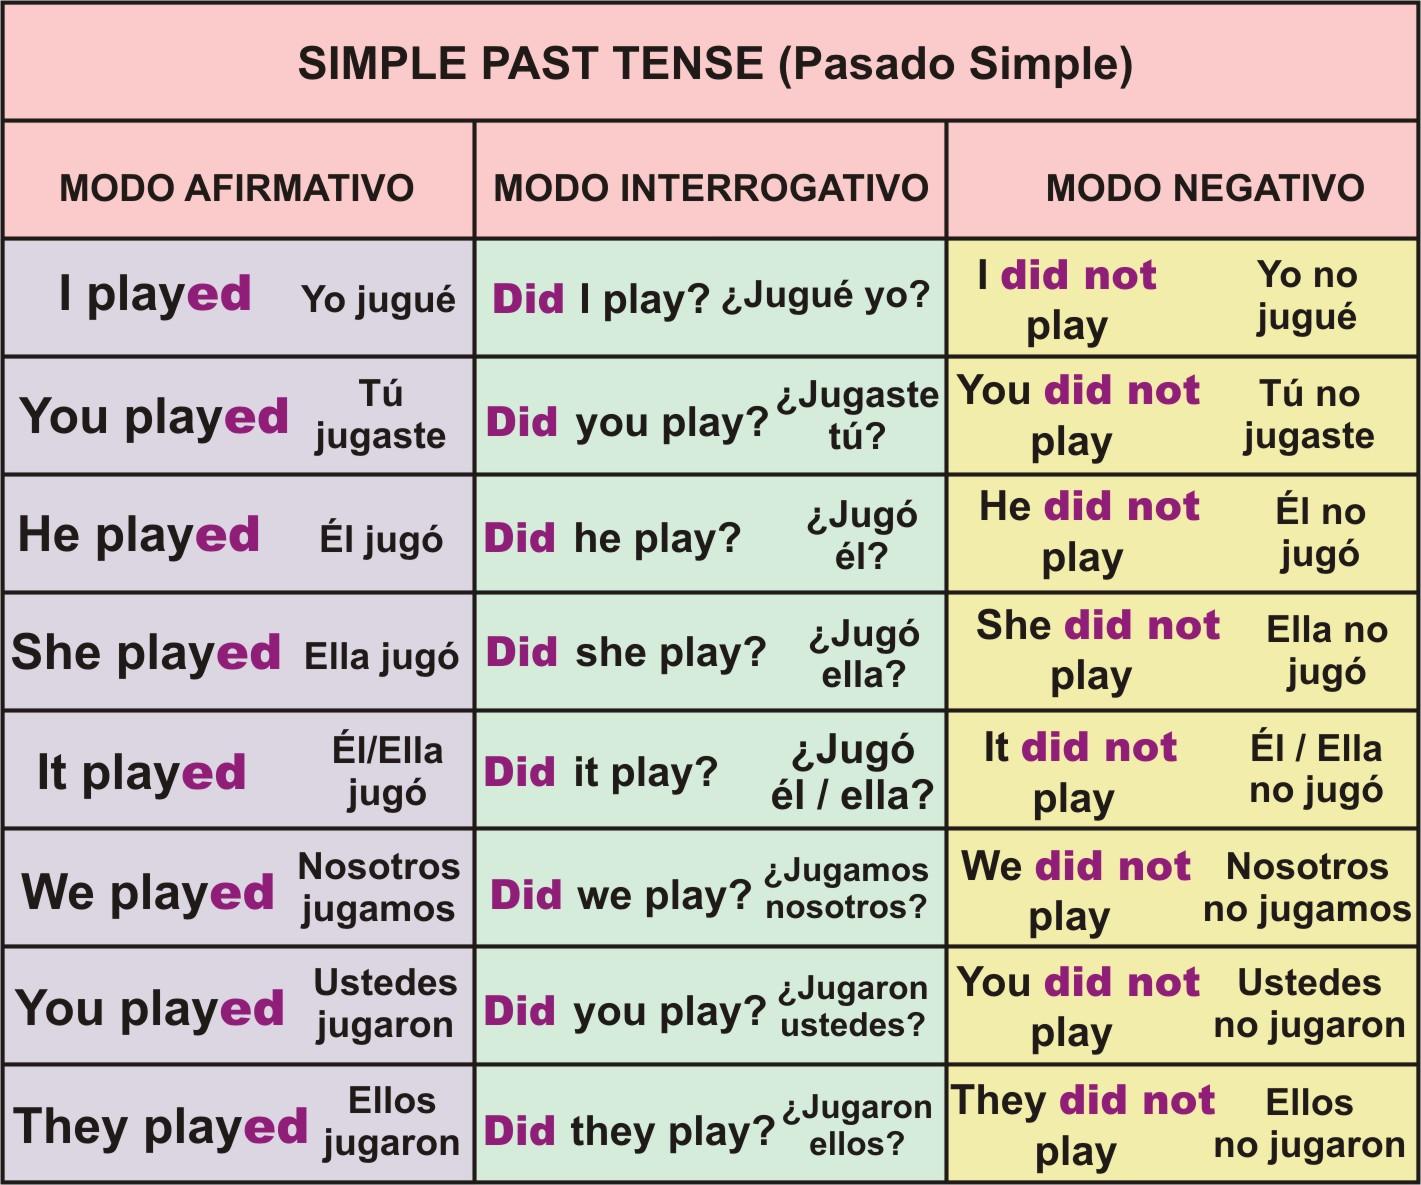 past tense: past tense